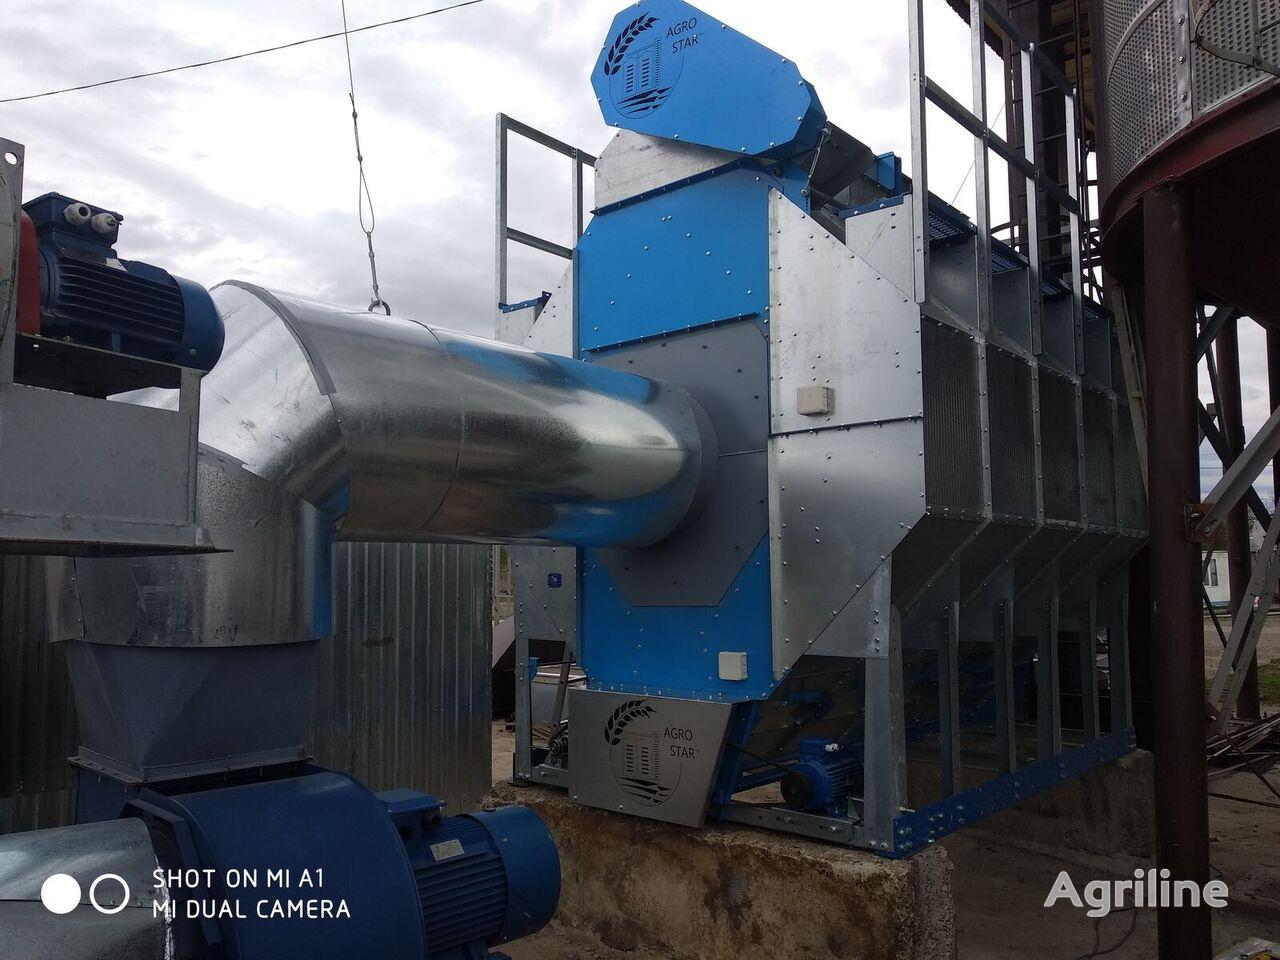 new AGRO STAR na shchepi ta vidhodah -25 % derzhavnoyi kompensaciyi grain dryer